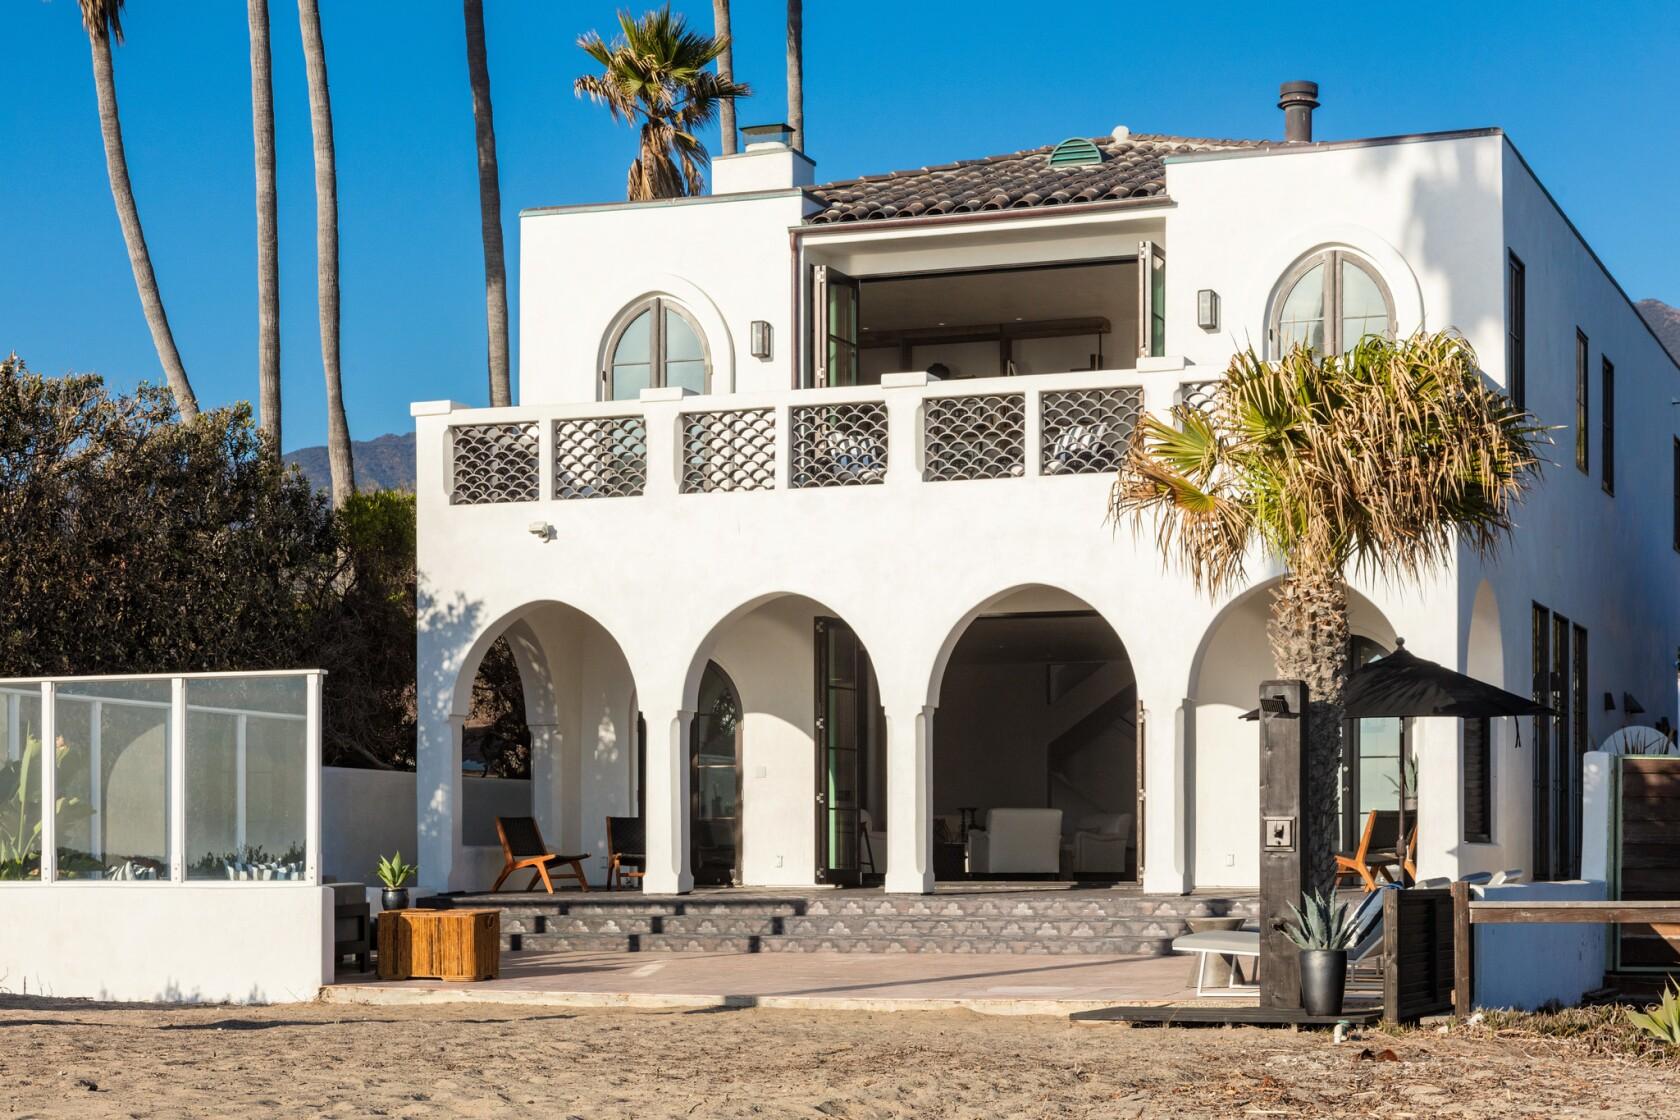 Carroll O'Connor's longtime Malibu home gets a fresh face